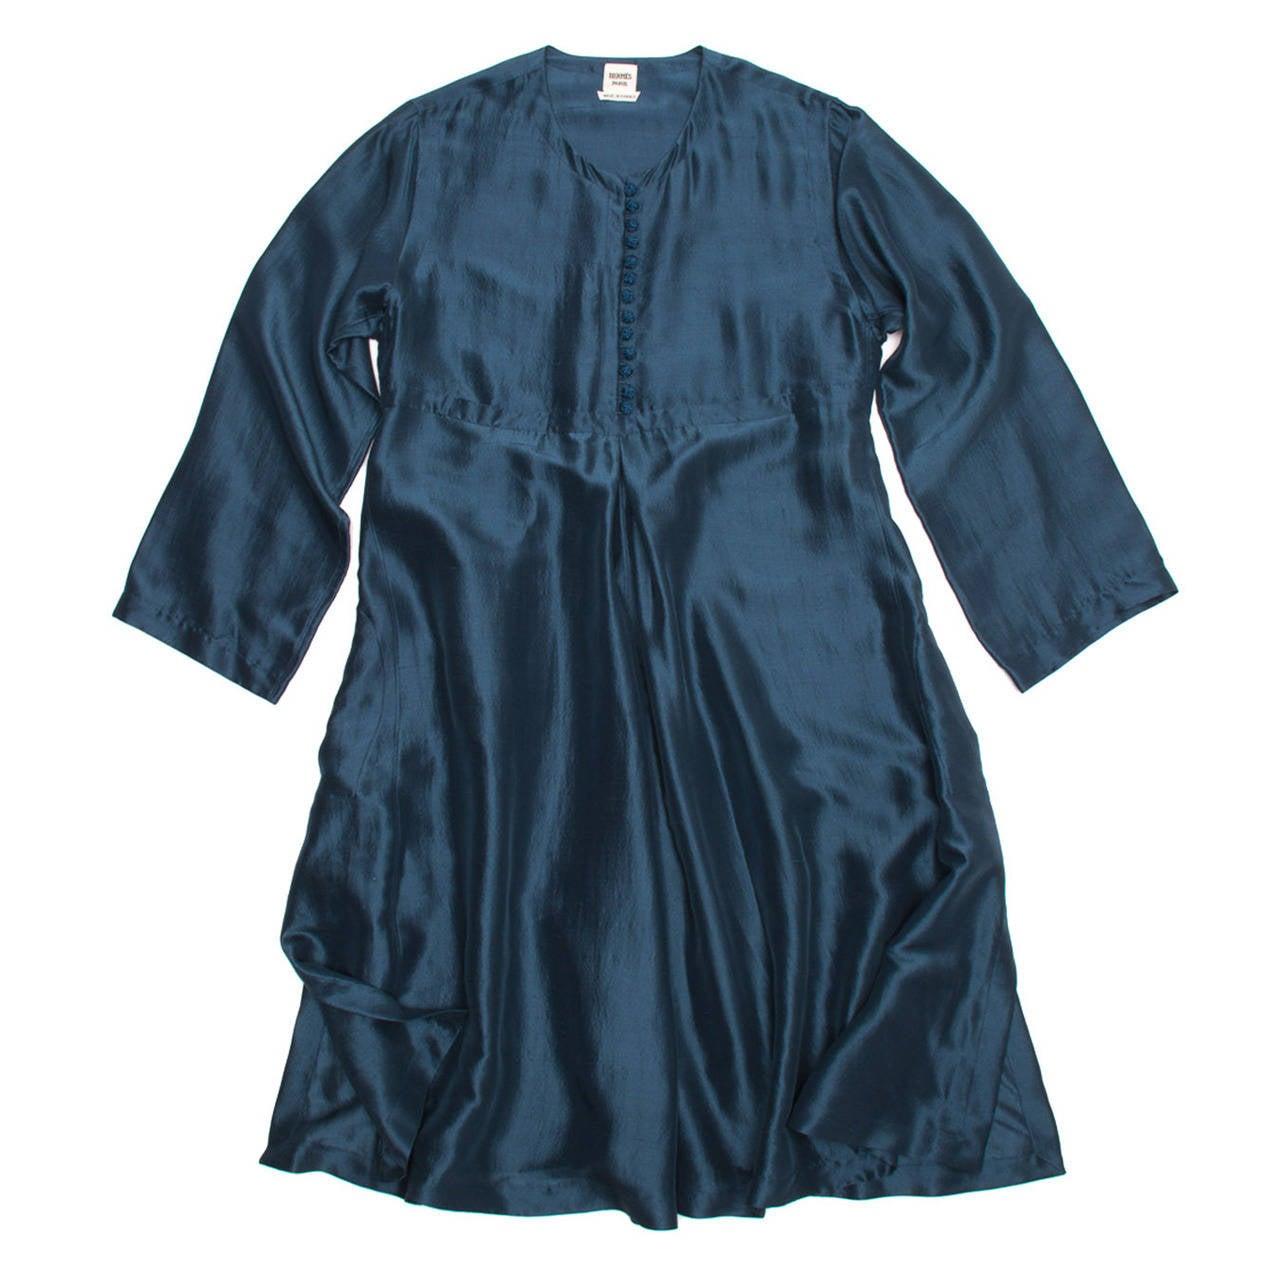 Hermes Silk Teal Tunic Dress 1